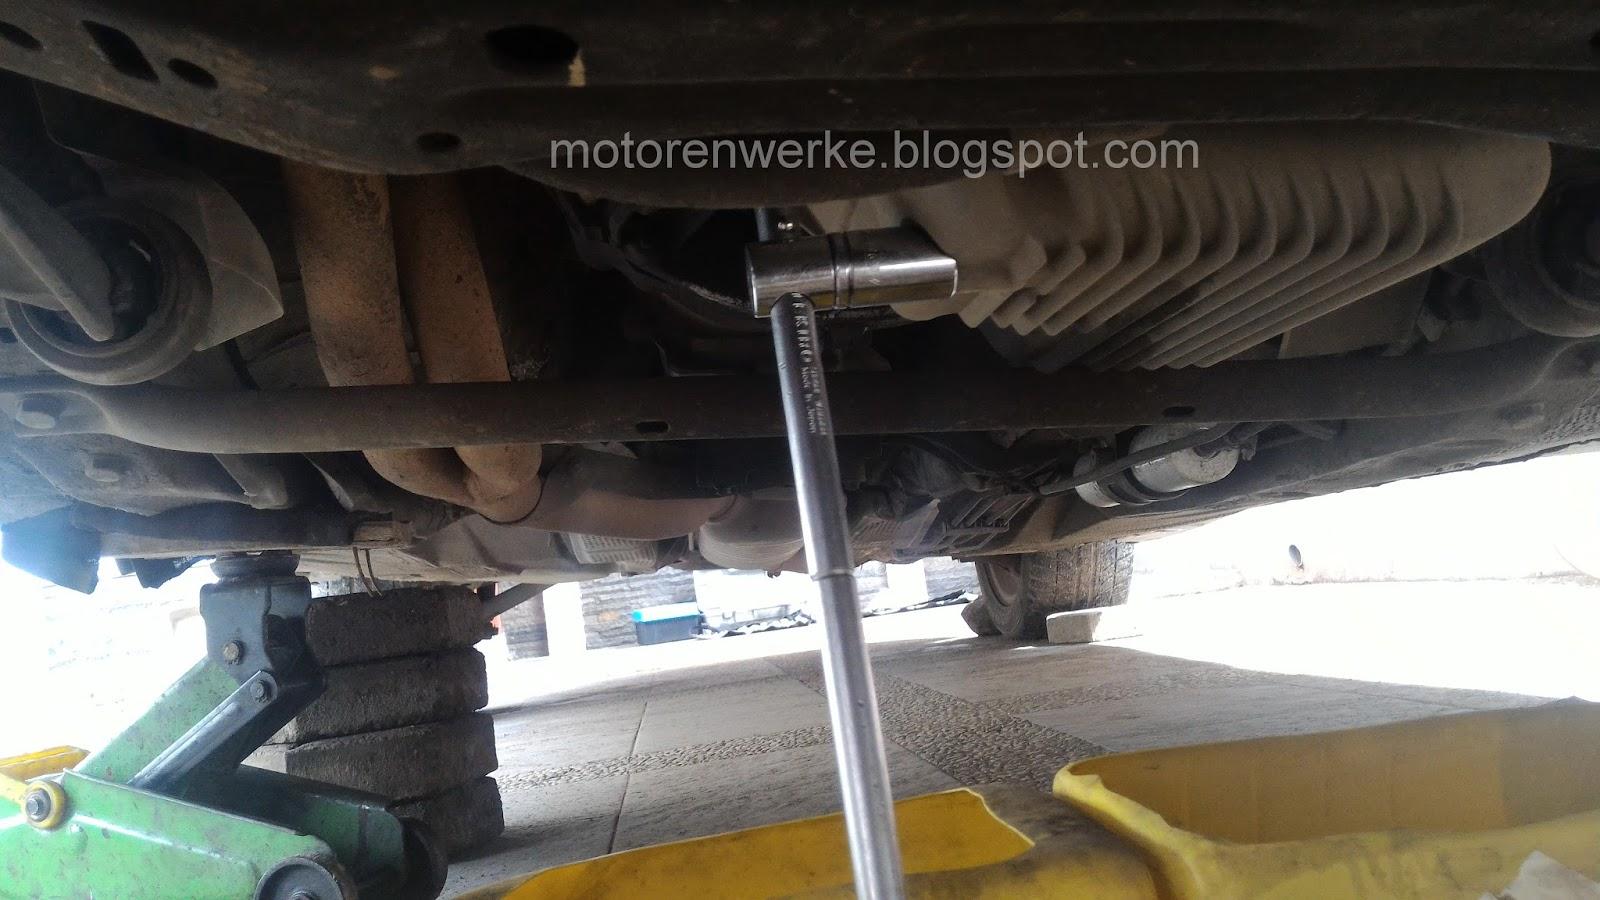 Motorenworks Mengganti Oli Mesin Bmw E36m43 Kunci Buka Rantai Siapkan Wadah Untuk Menampung Bekas Kemudian Baut Oil Pan Menggunakan 17 Mm